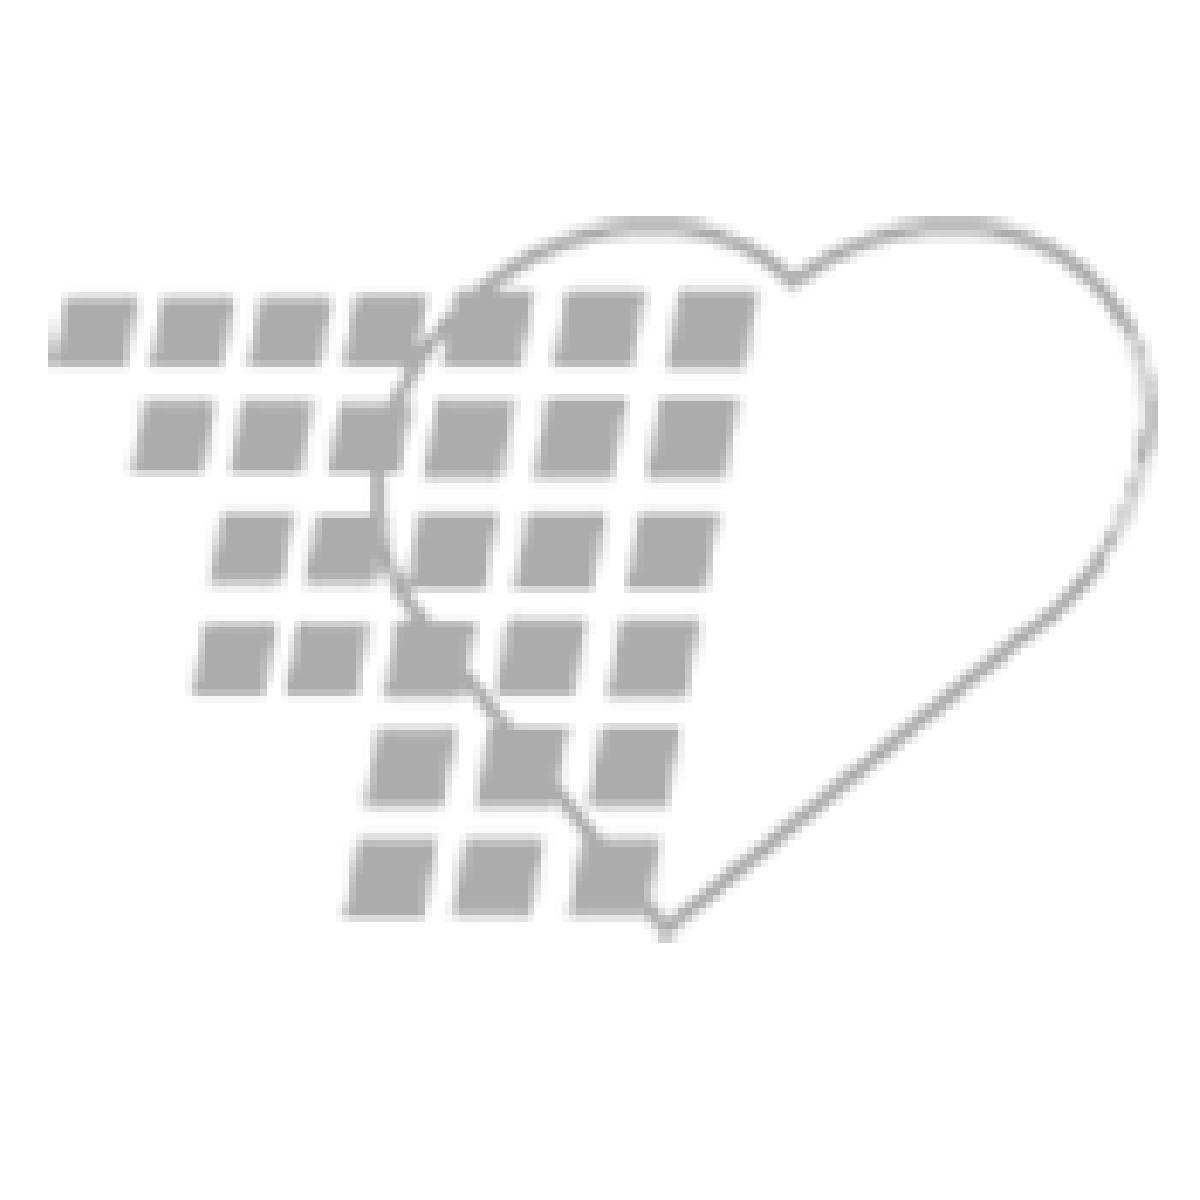 06-93-5000 - Demo Dose® Nitr Ointment 2% 30g